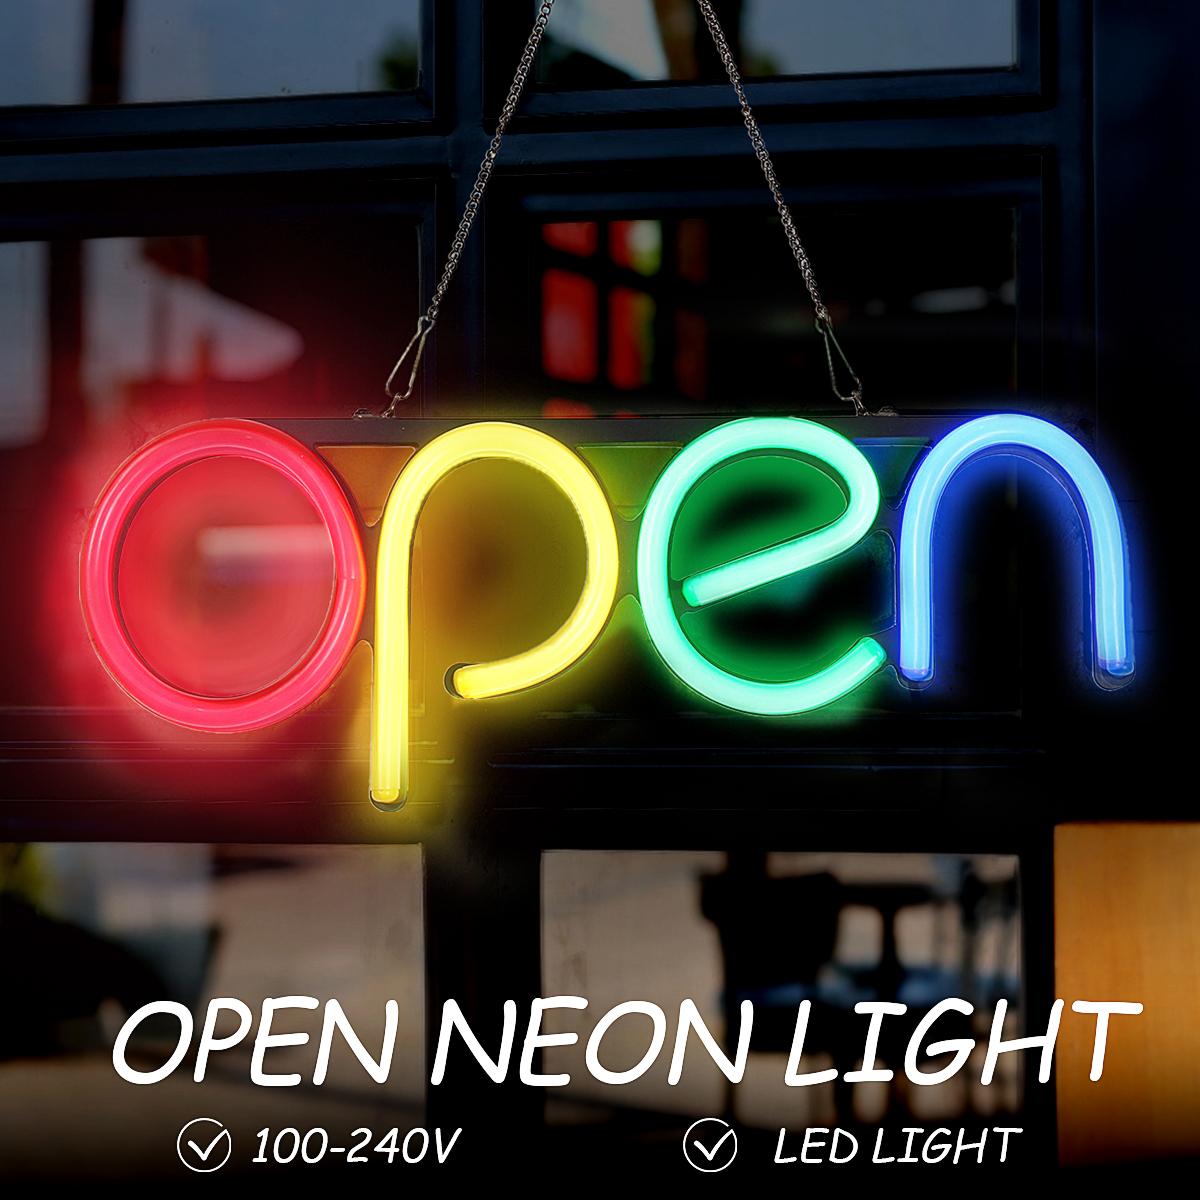 16'' Handmade Visual Artwork Bar Club KTV Wall Decoration Commercial Lighting Colorful Neon Bulbs OPEN Neon Sign LED Light Tube